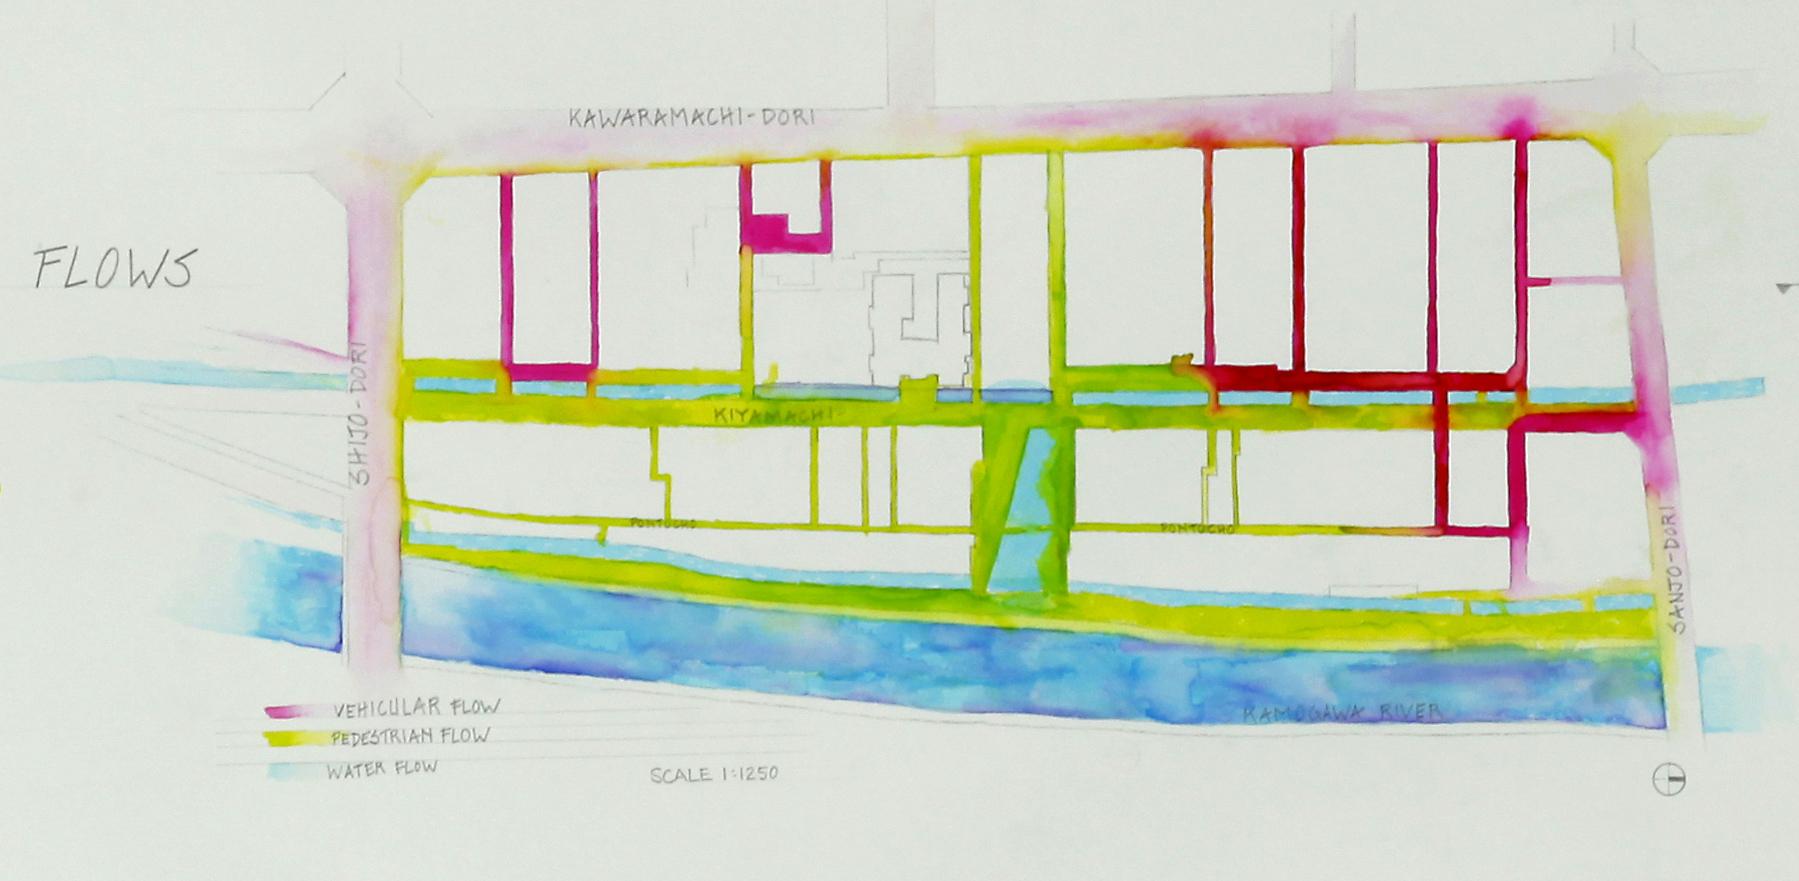 flows diagram